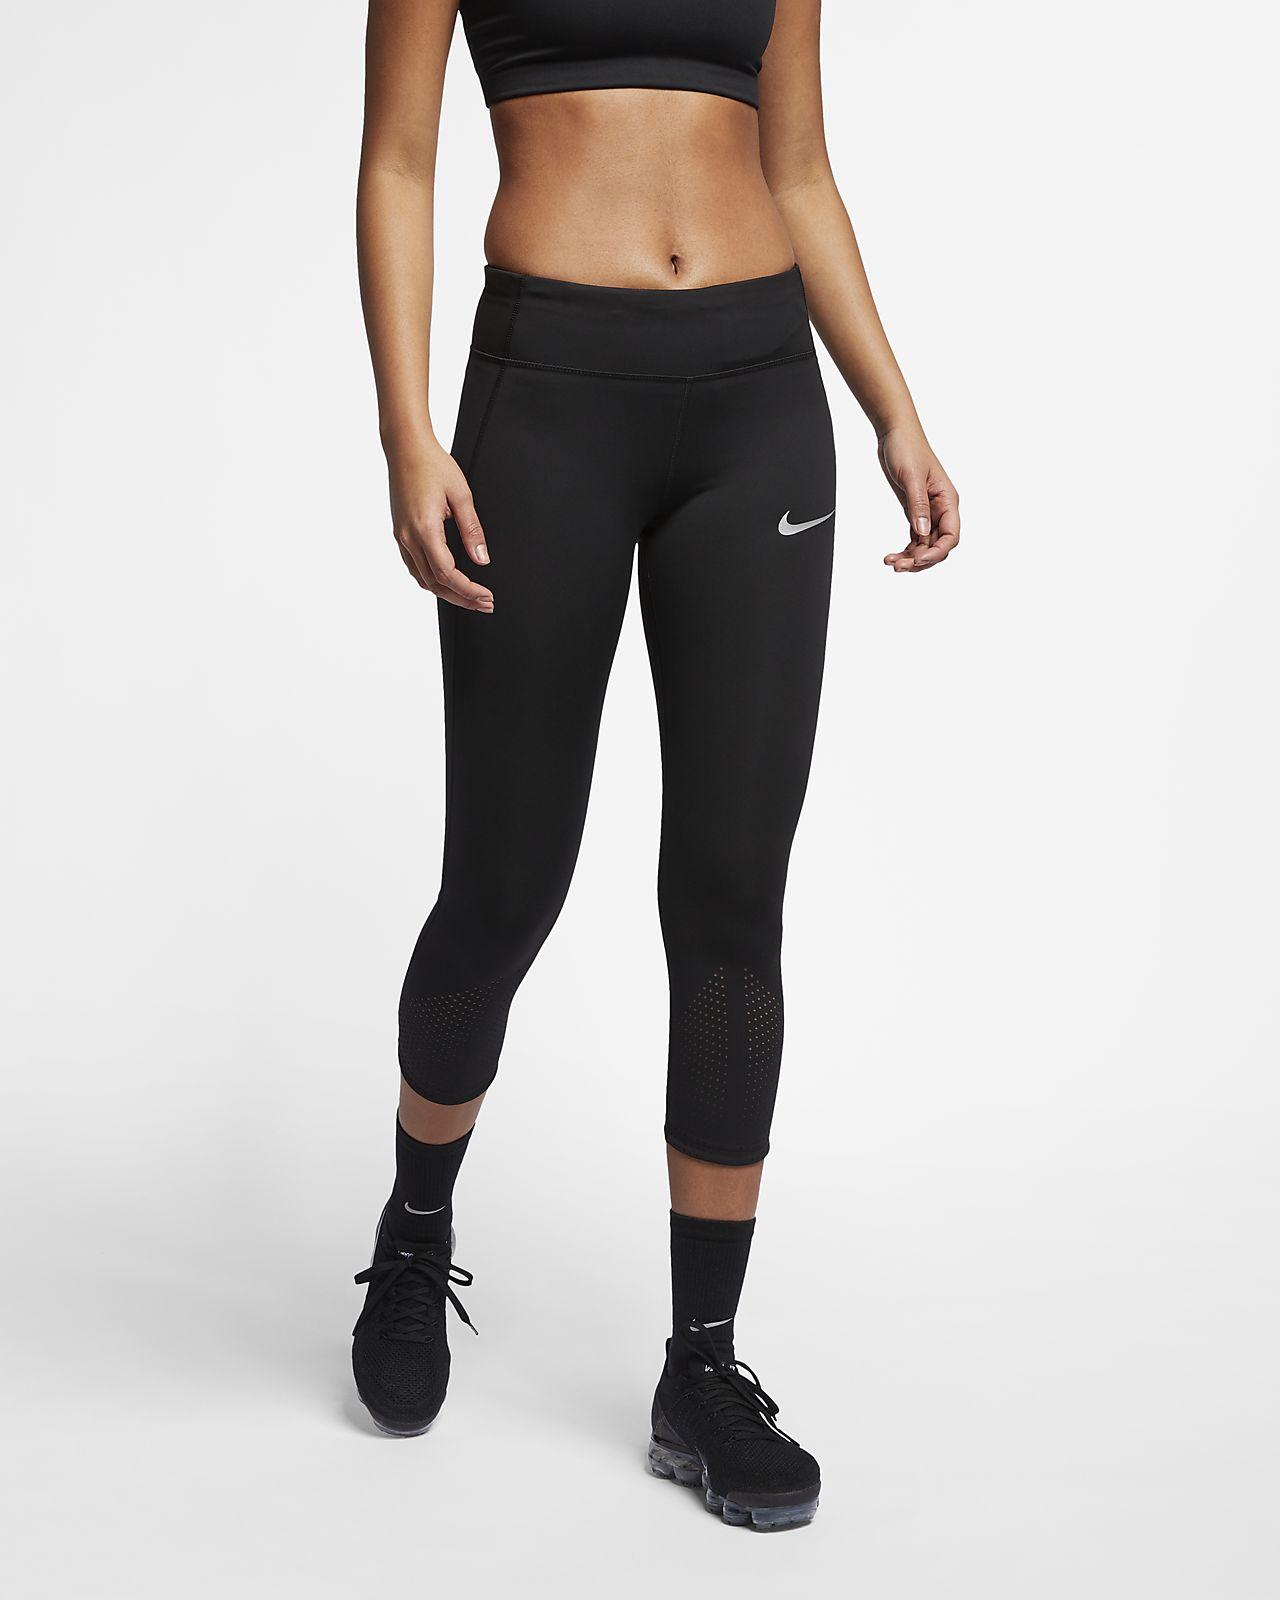 Pescadores de running para mujer Nike Epic Lux